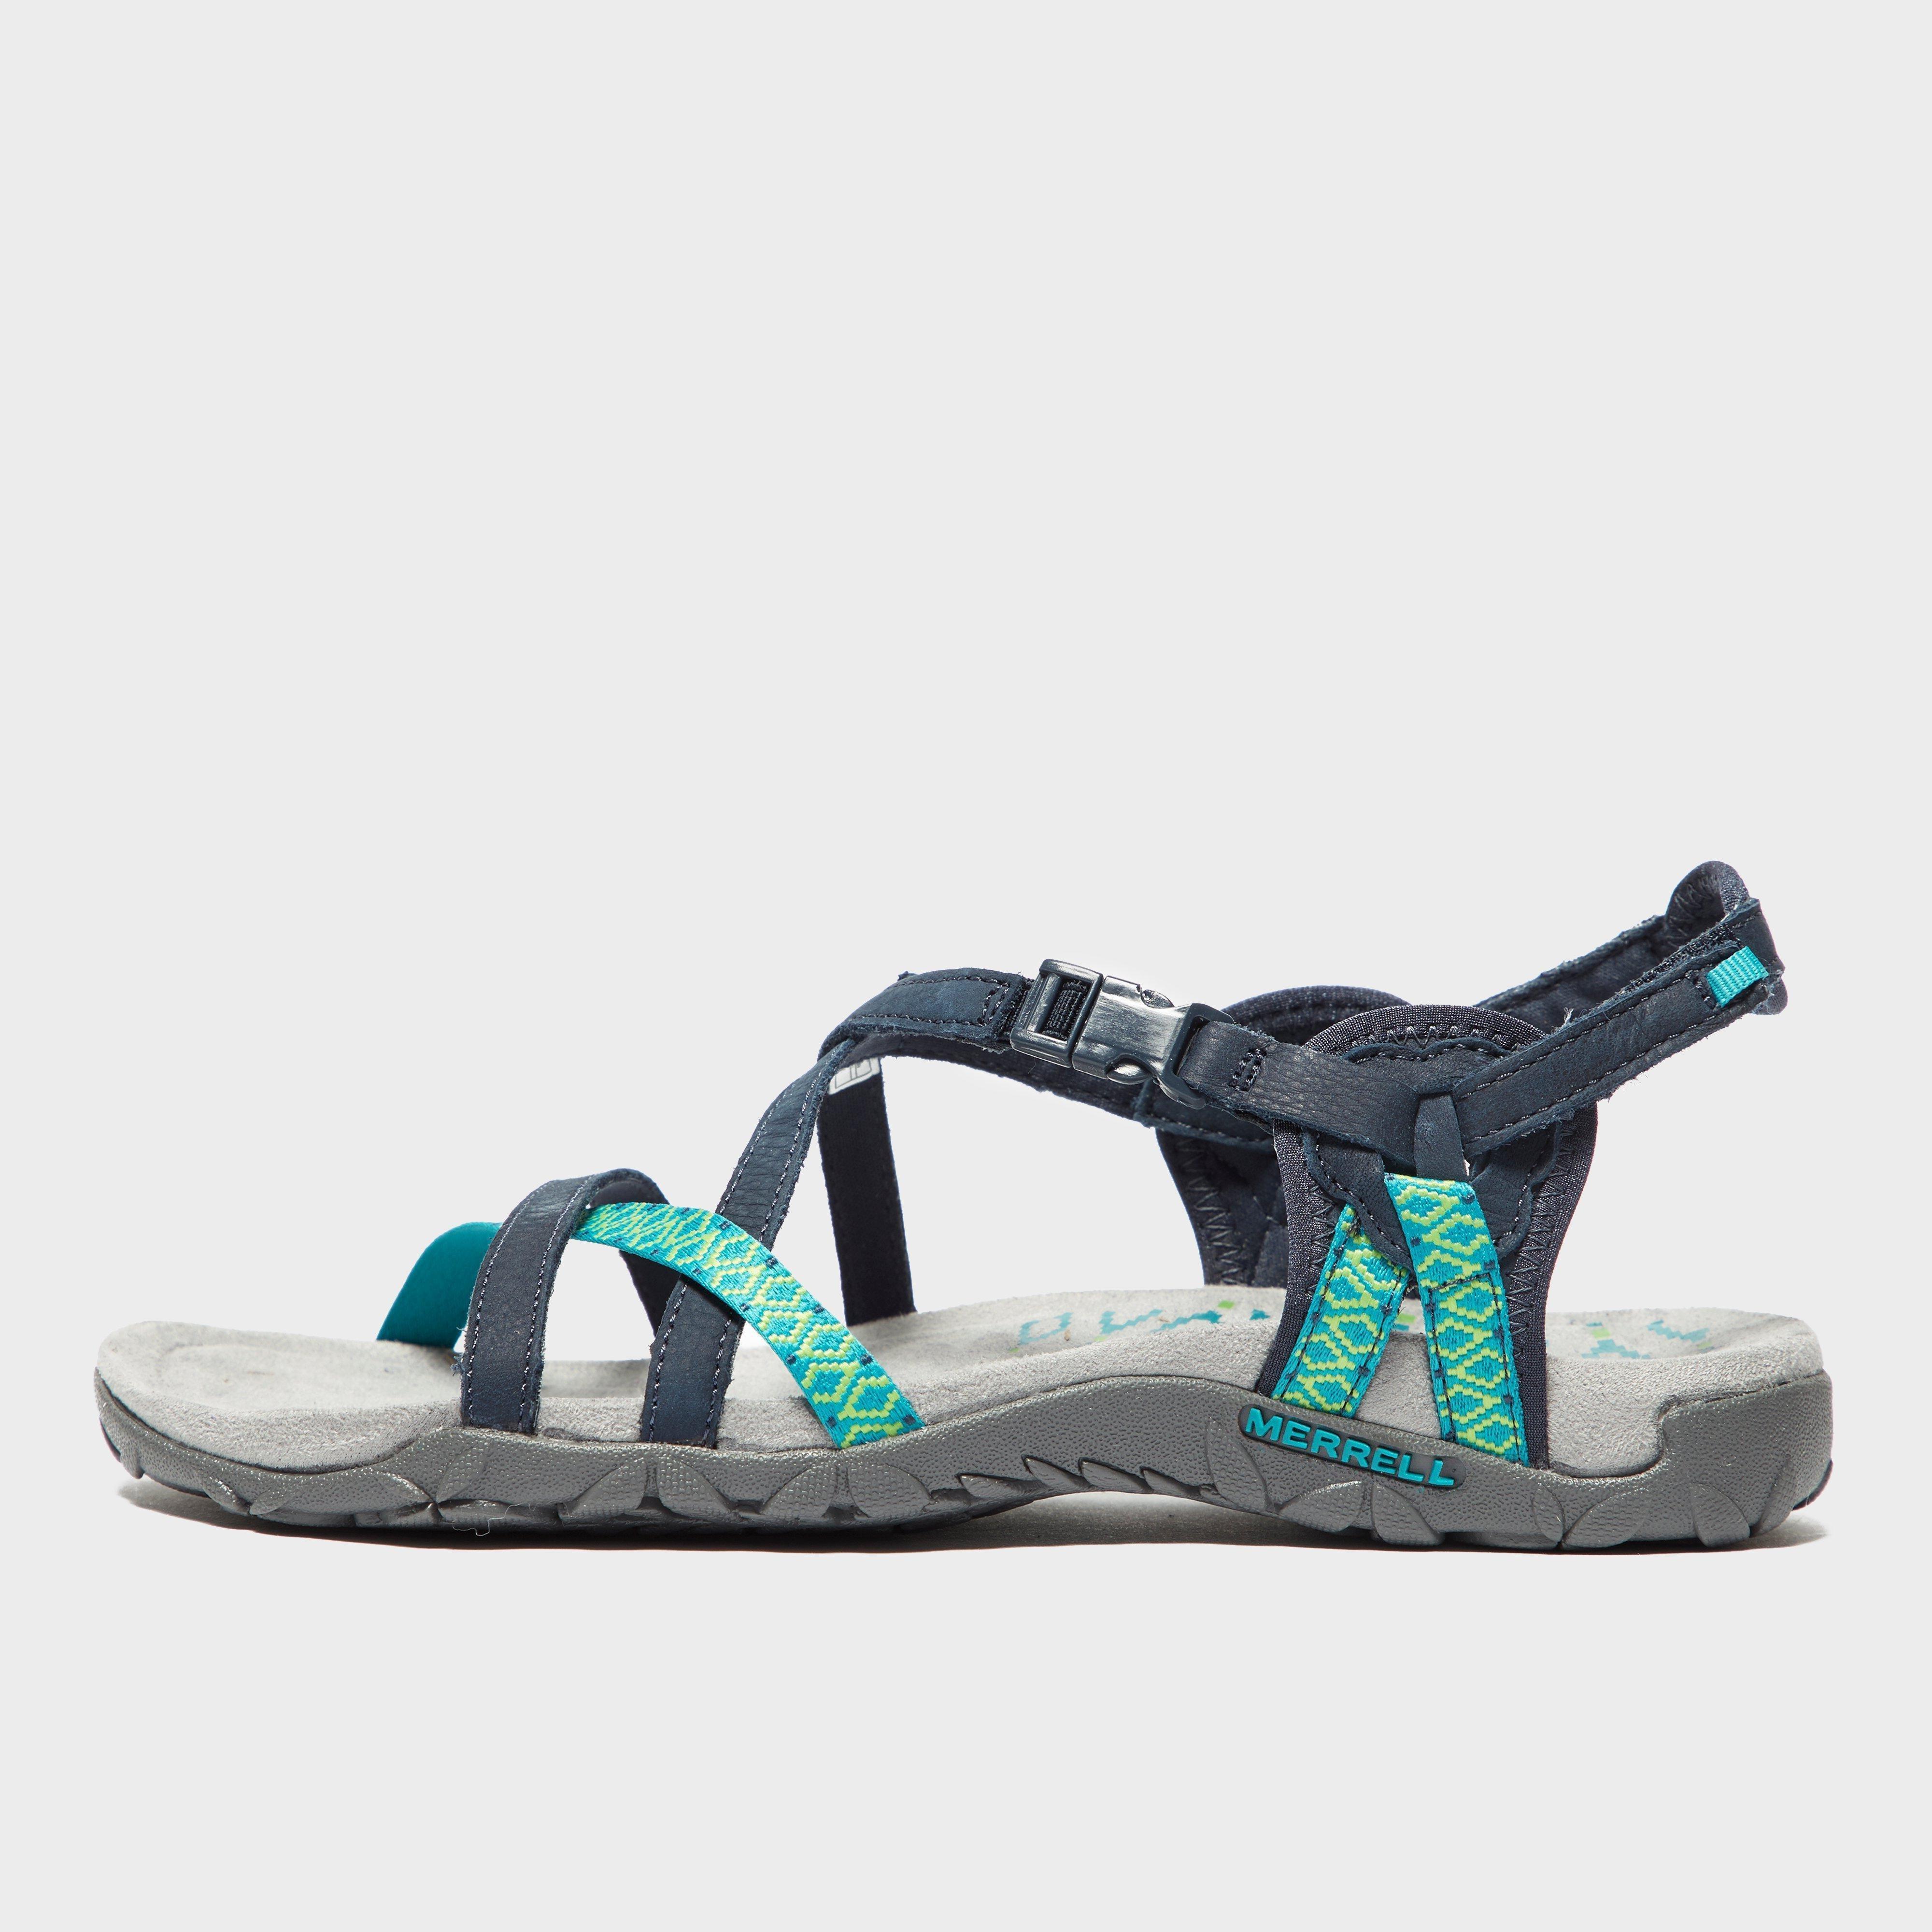 495ad9739bb Blue MERRELL Women s Terran Lattice Sandals image 1